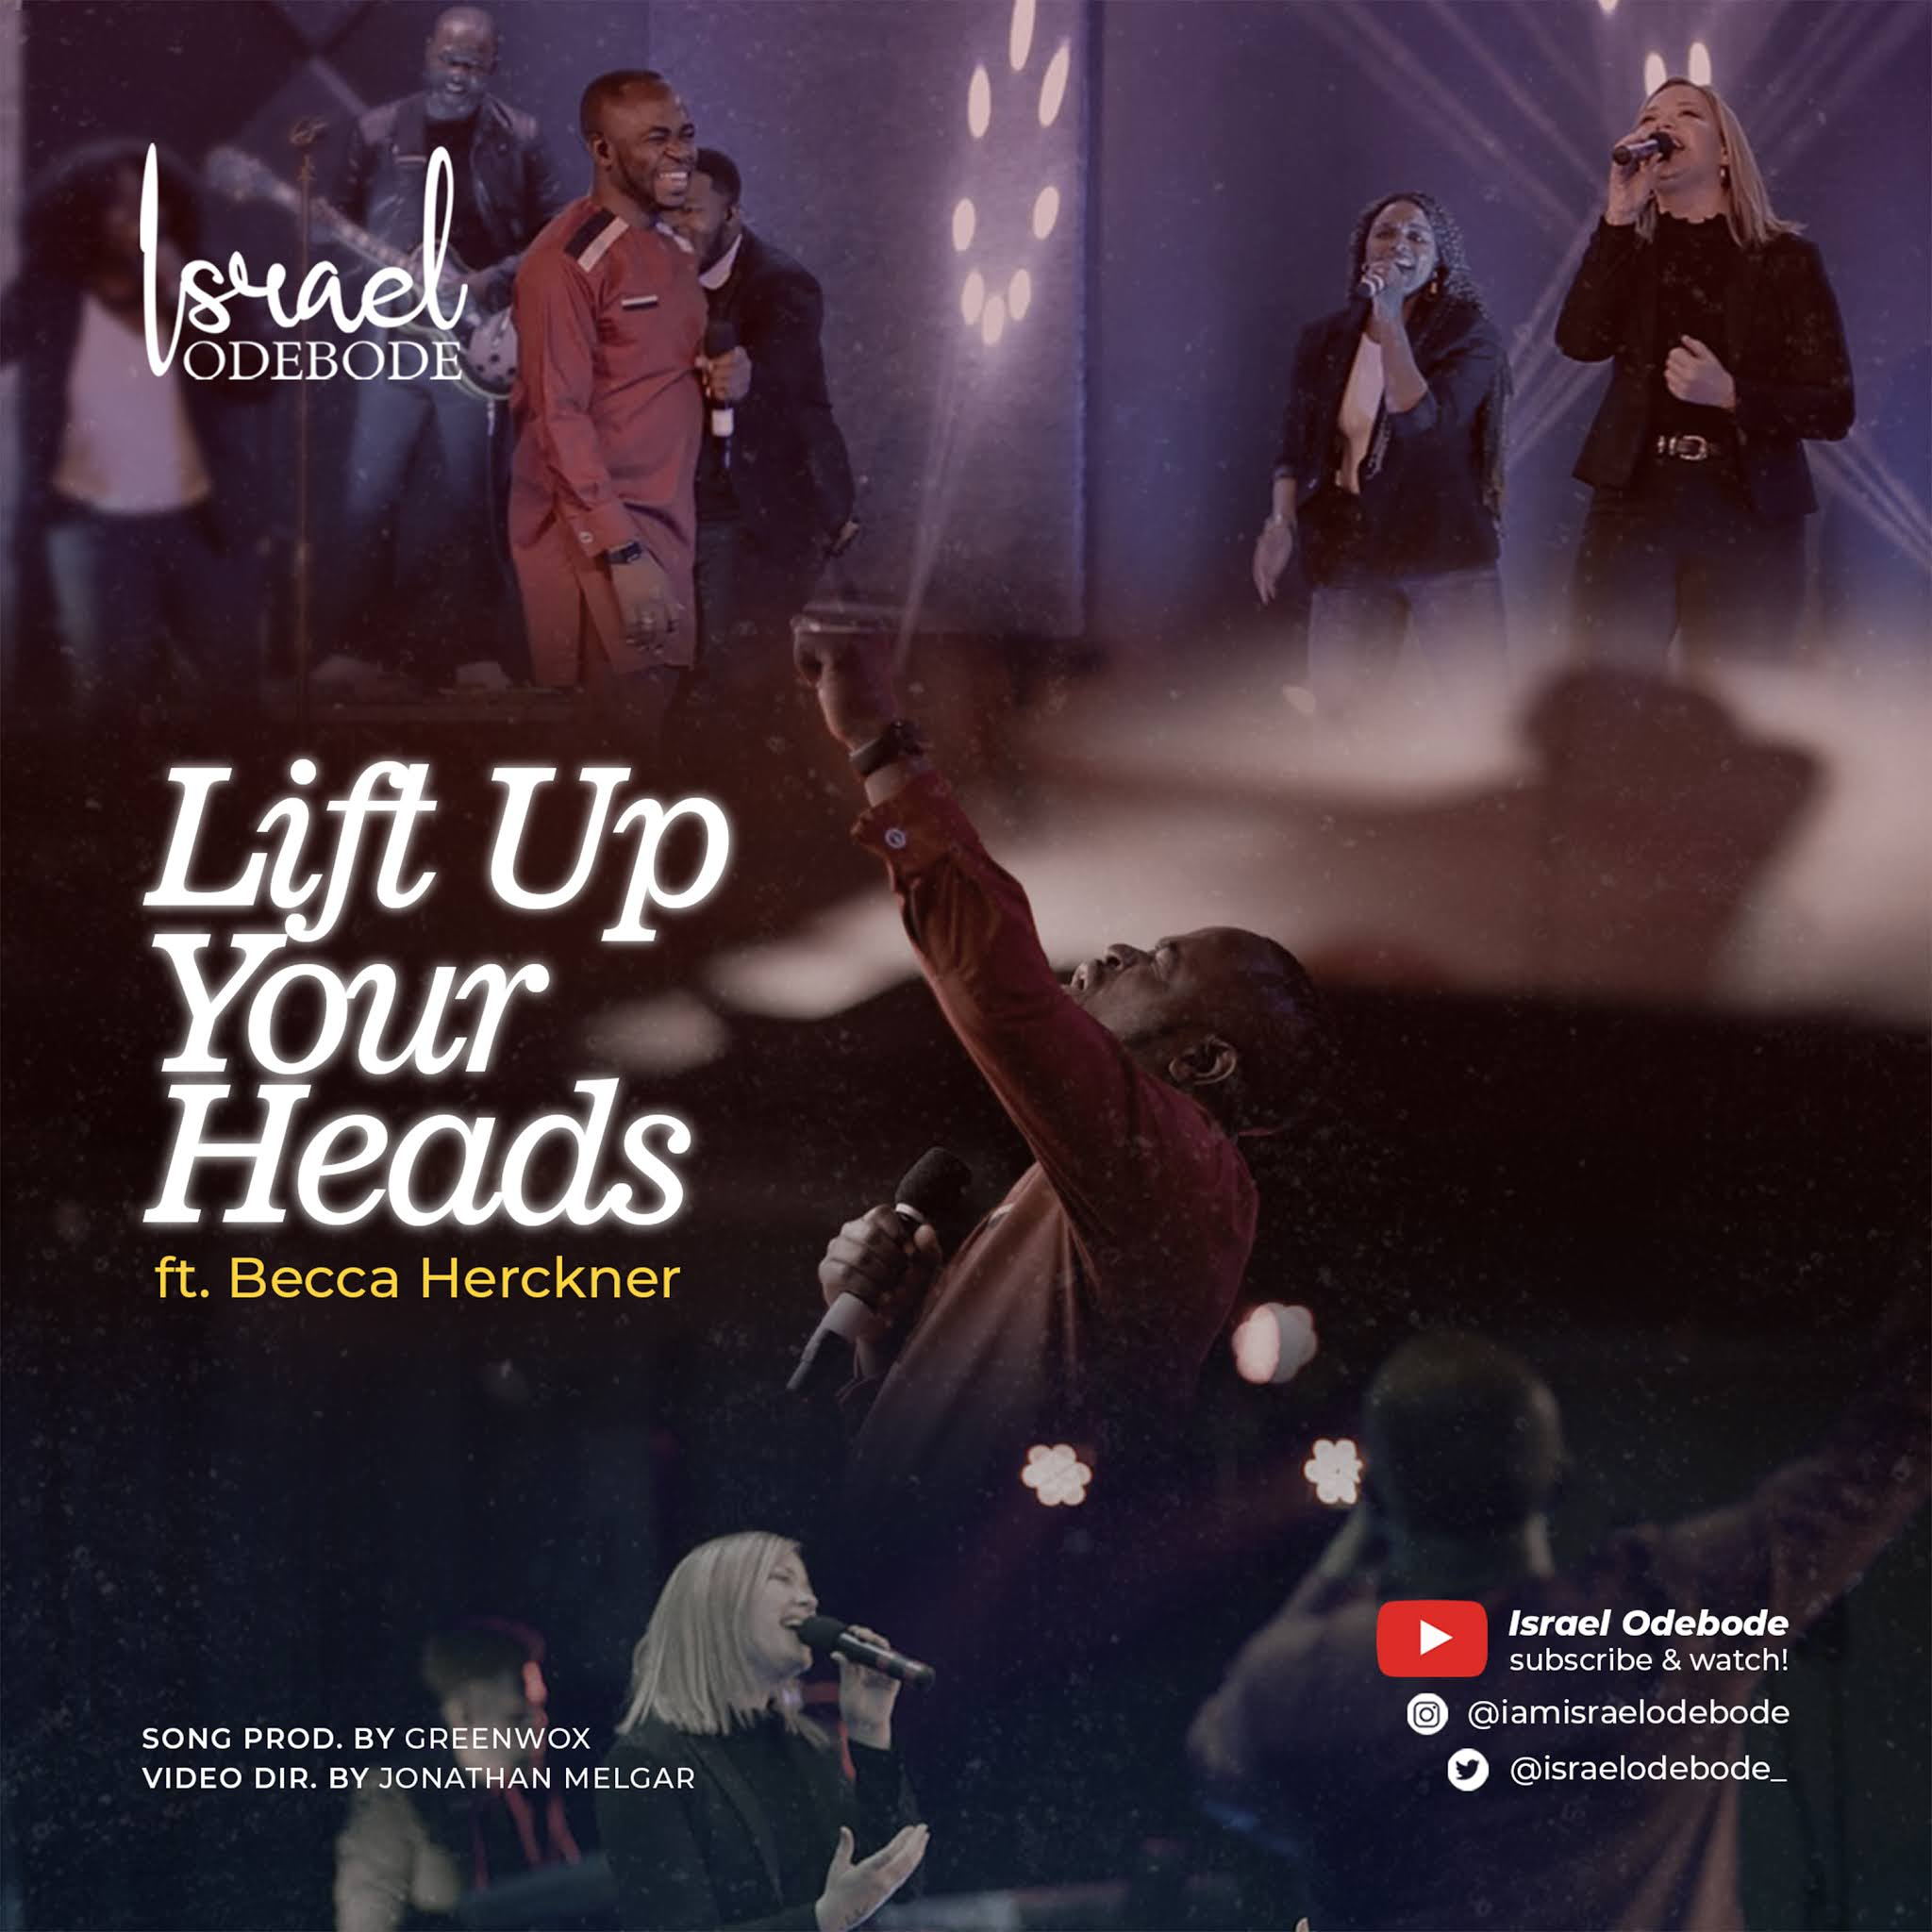 [Music + Video]  Lift Up Your Heads - Israel Odebode (ft. Becca Herckner)